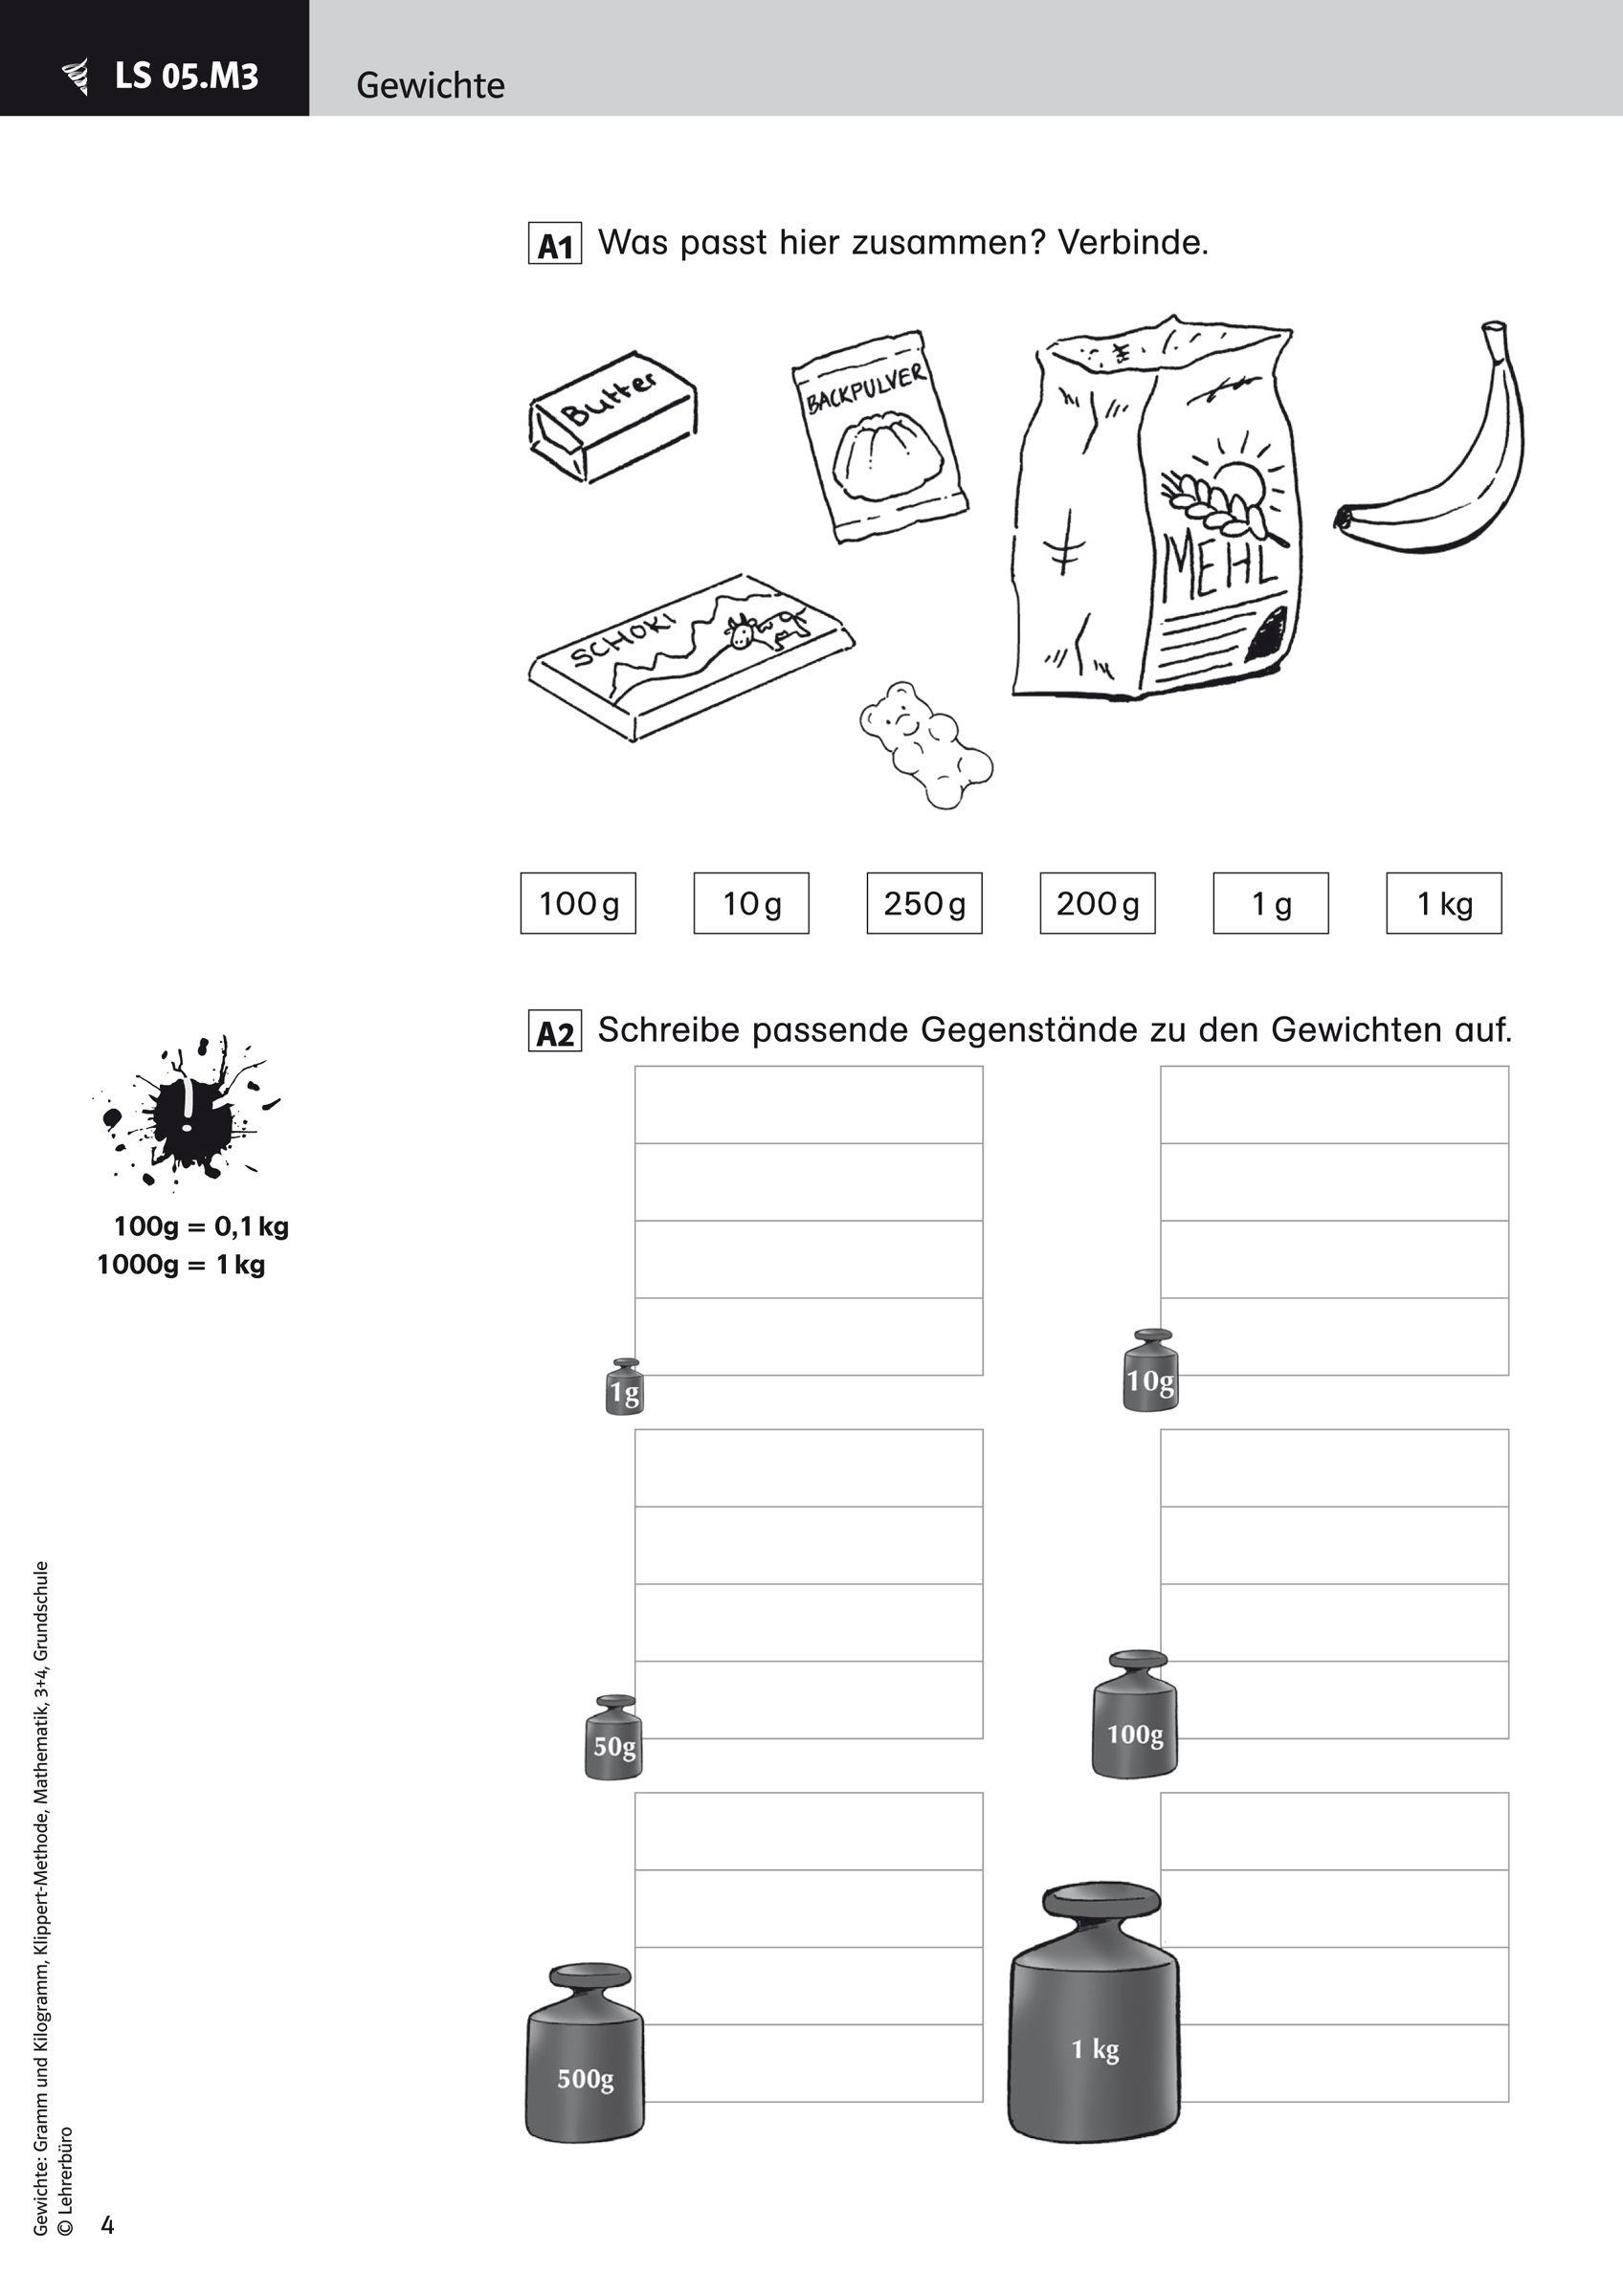 16 arbeitsblatt 3 klasse gewichte bathroom gewichte erste klasse und arbeitsbl tter. Black Bedroom Furniture Sets. Home Design Ideas